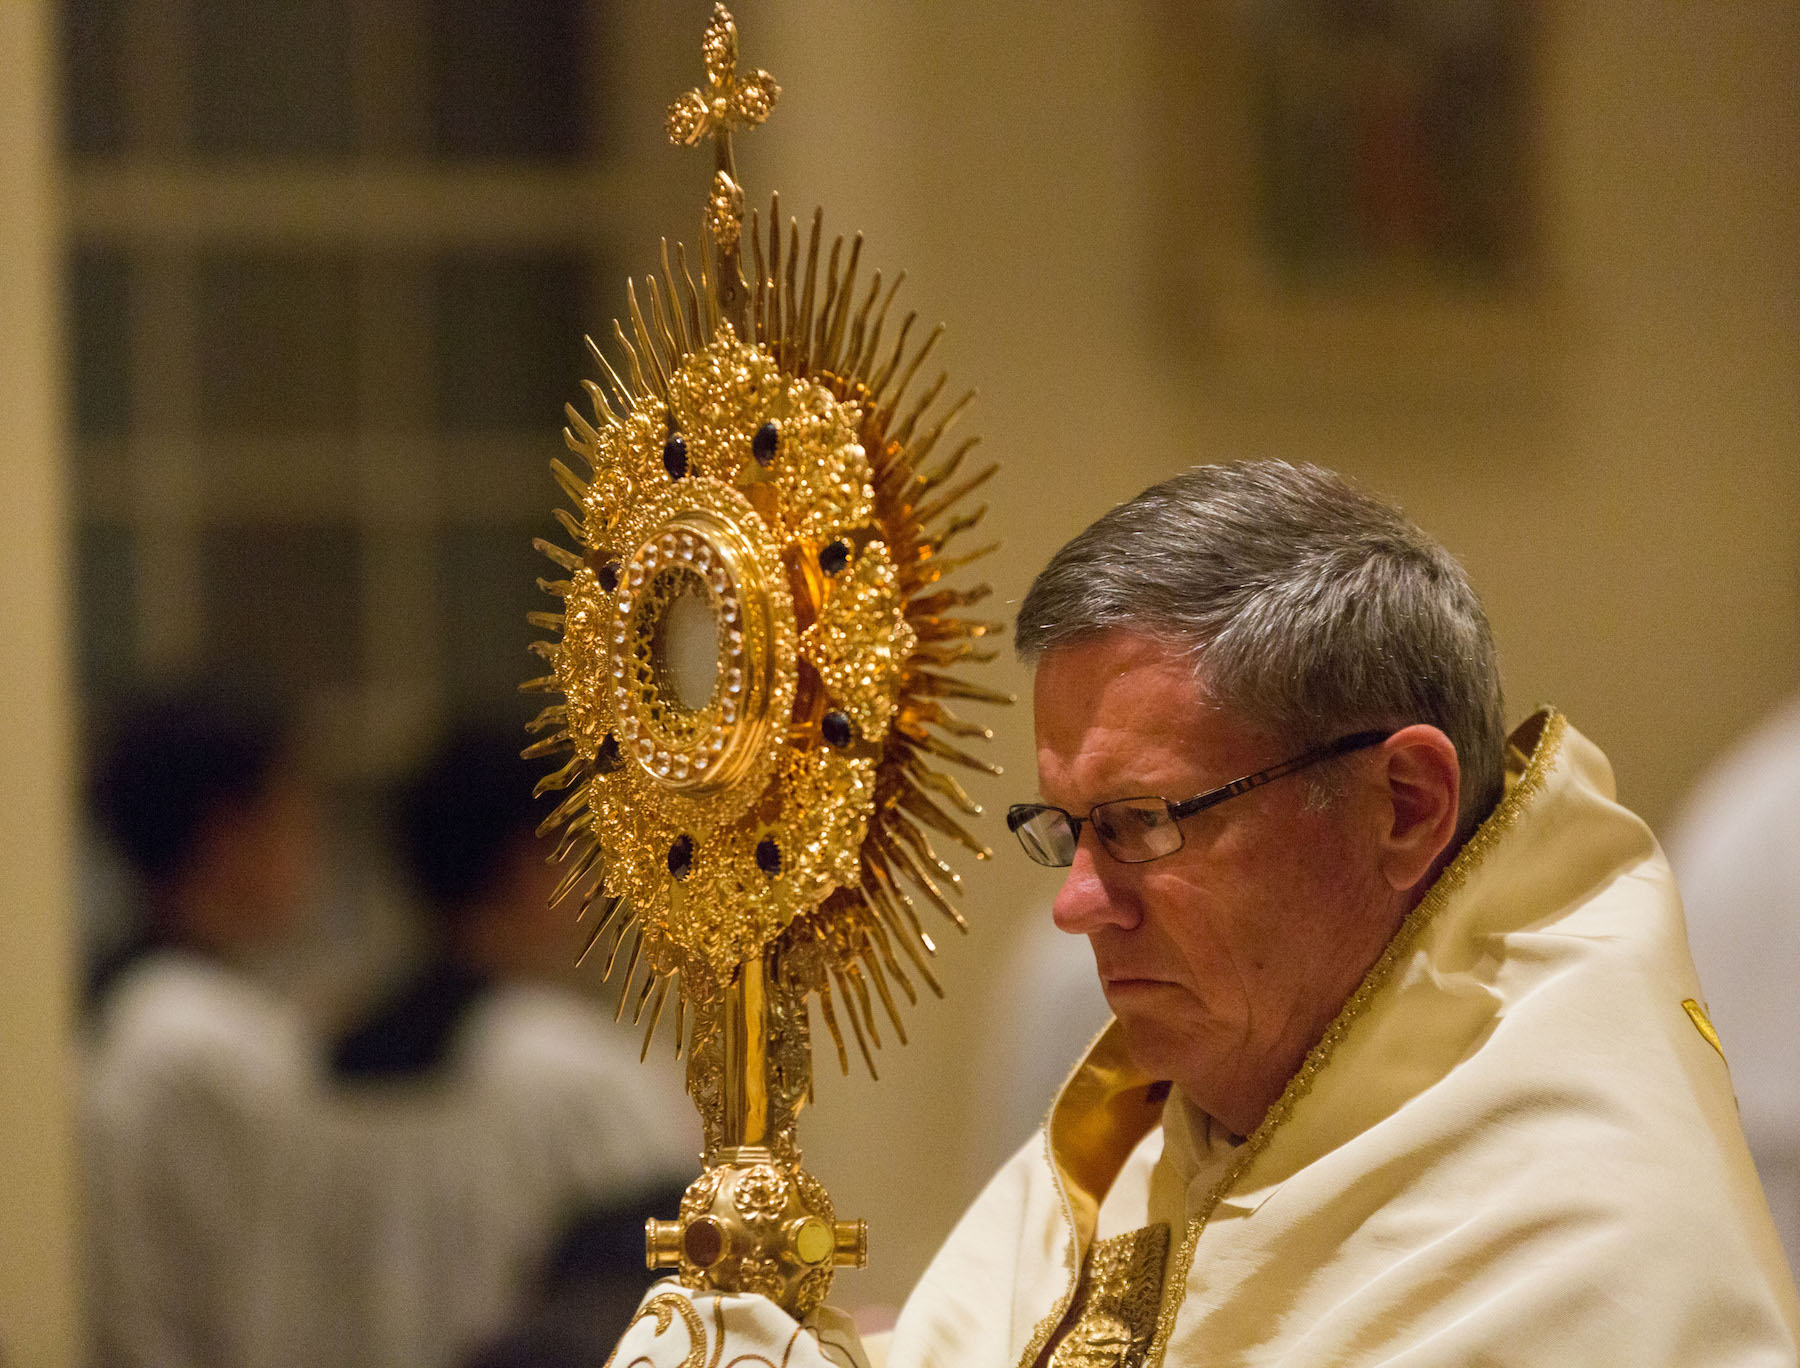 SacramentalPresence